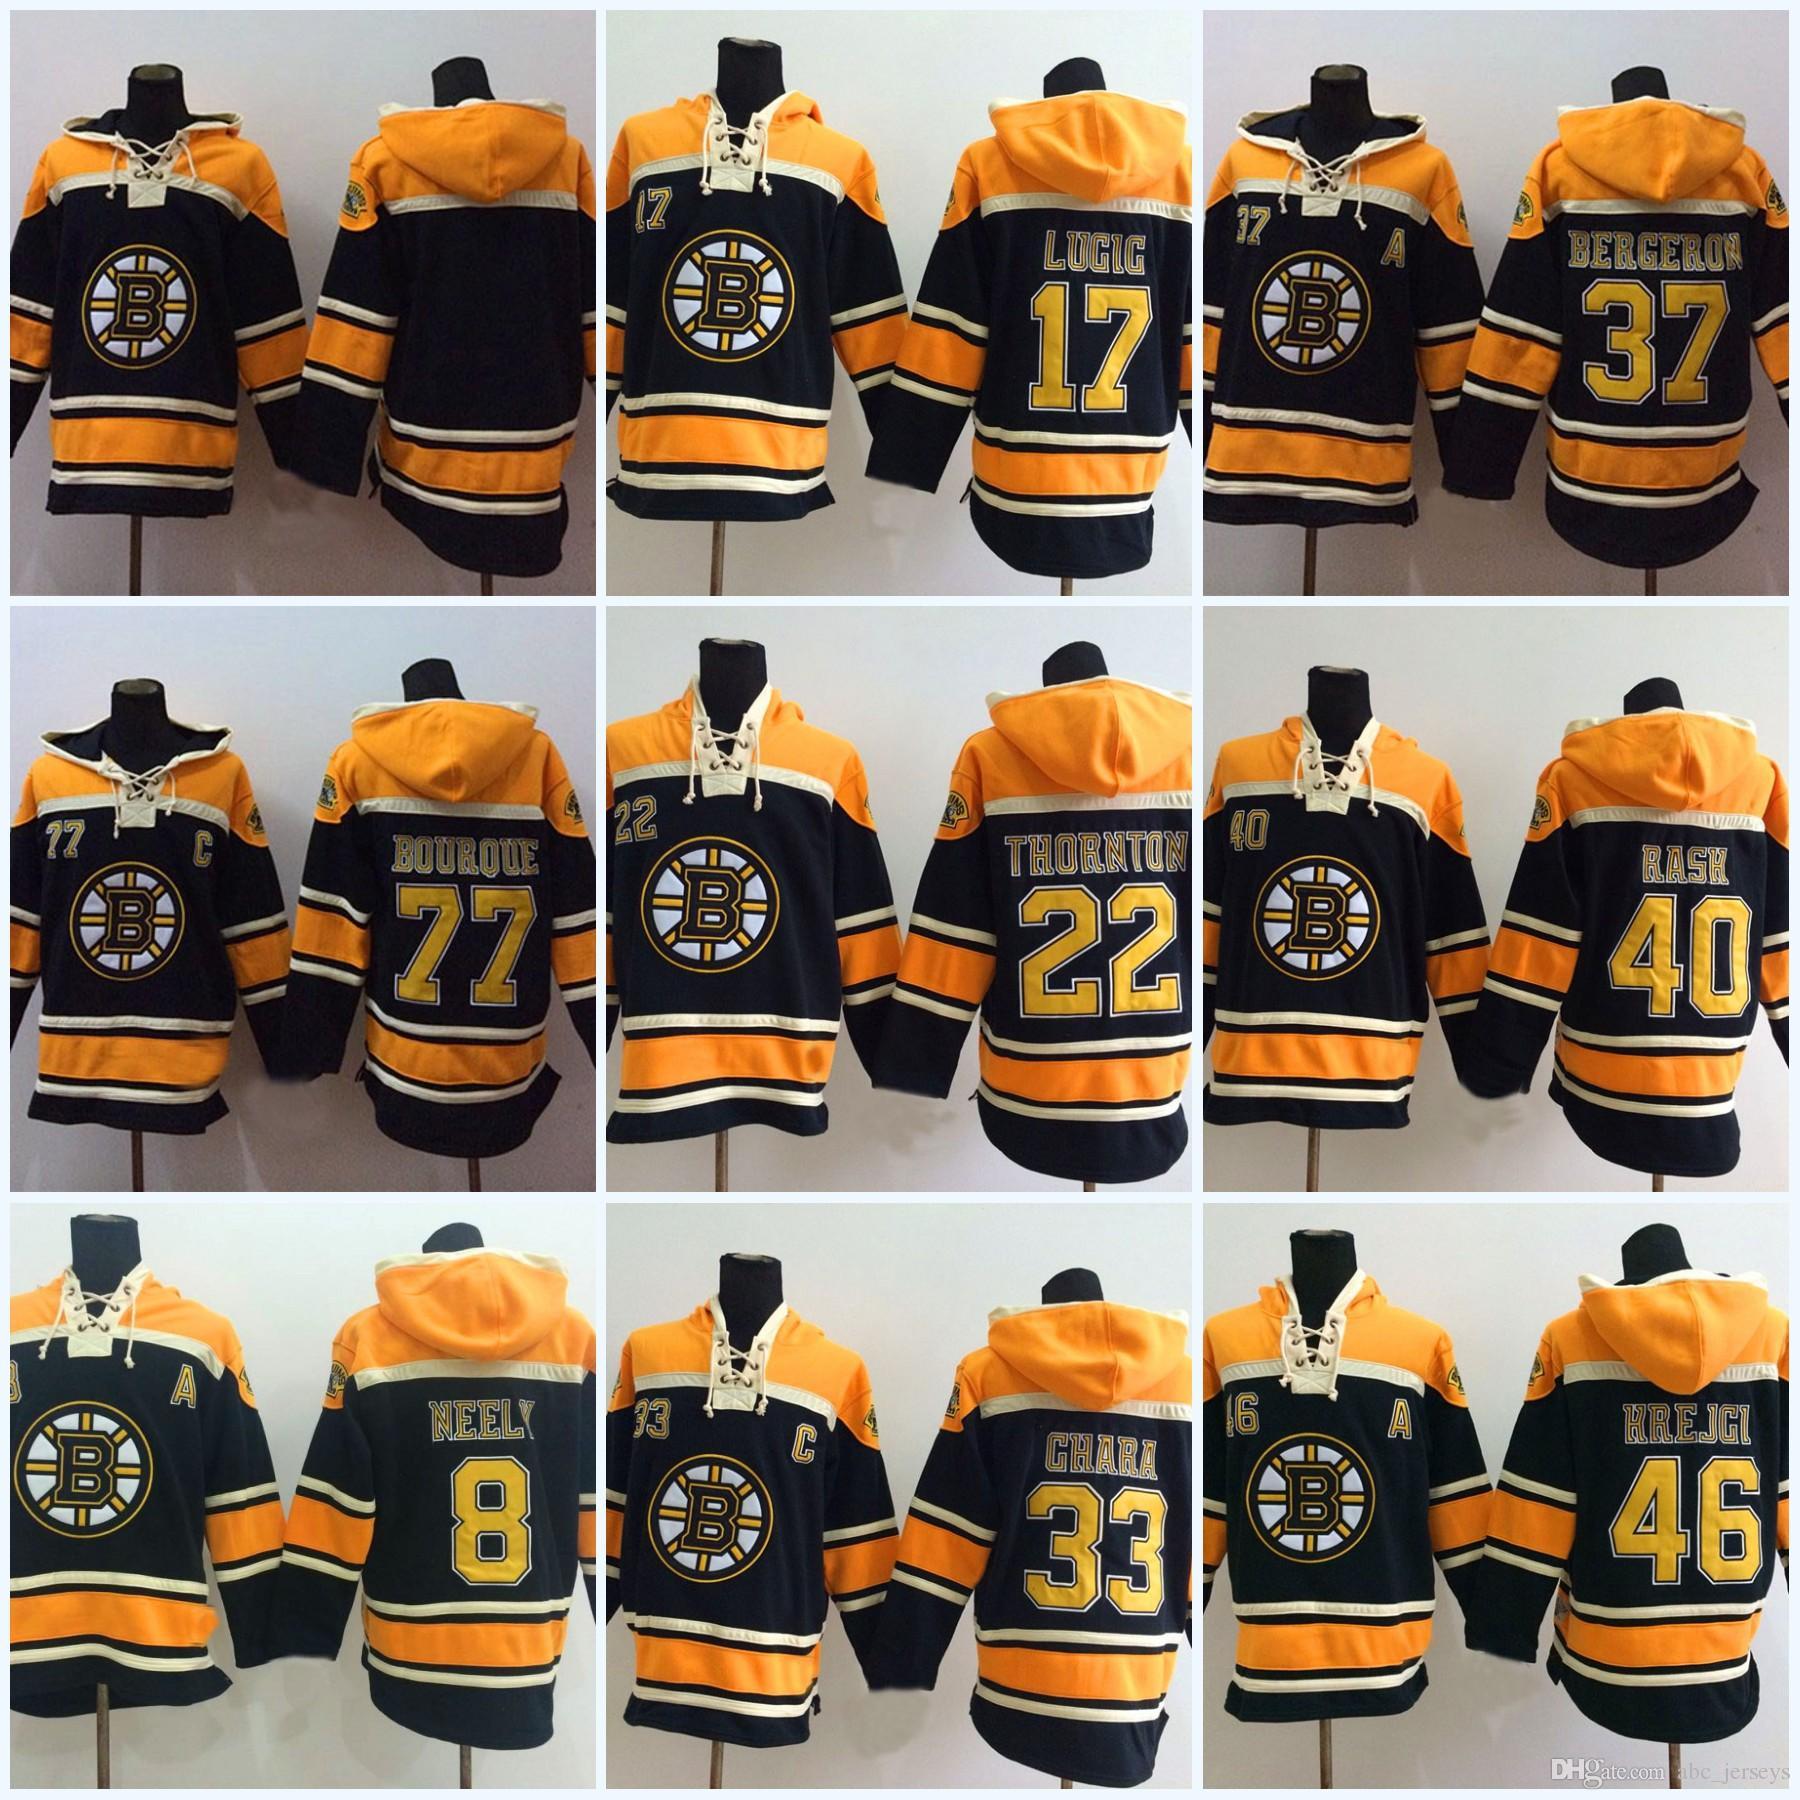 5fb7251f29c 40 Tuukka Rask Boston Bruins Jersey 8 Cam Neely 17 Milan Lucic 22 ...